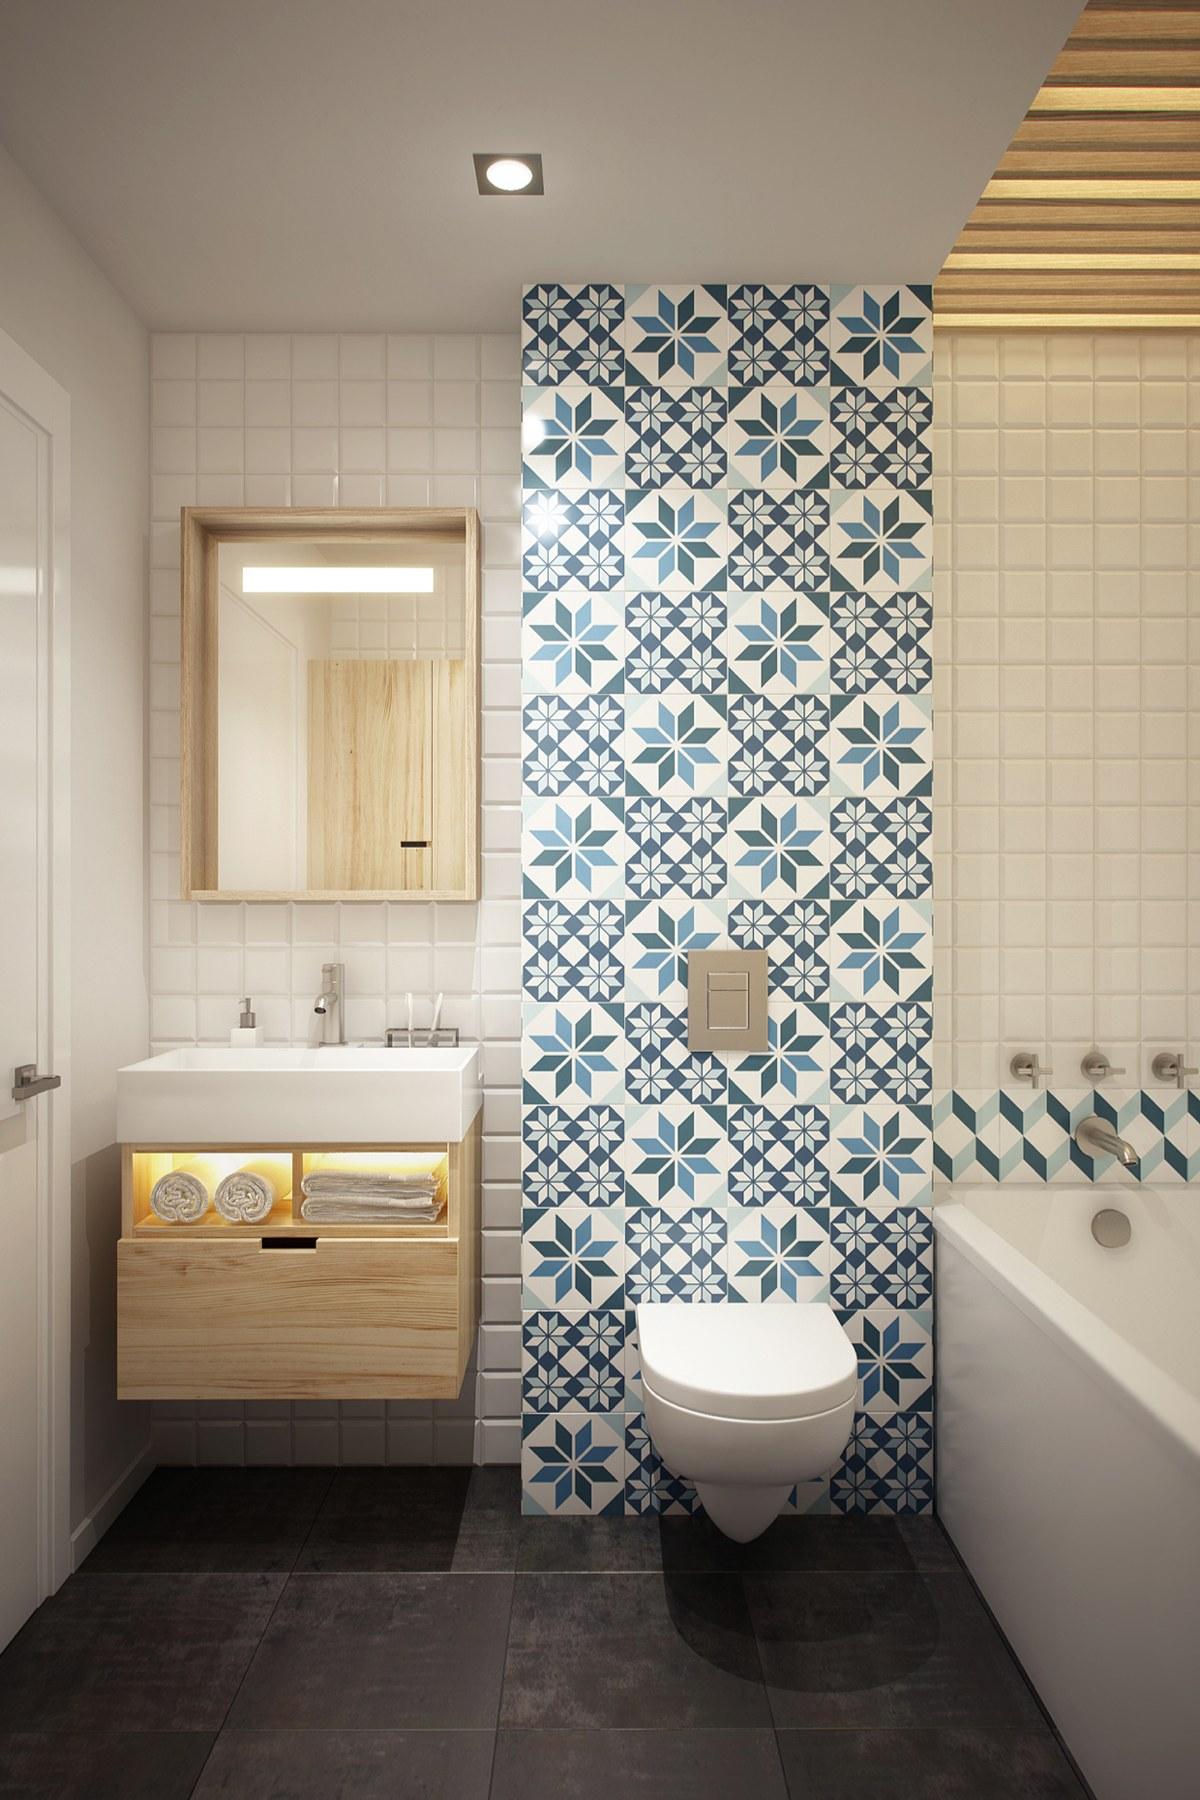 Modern Bathroom Tiles Design - HD Wallpaper